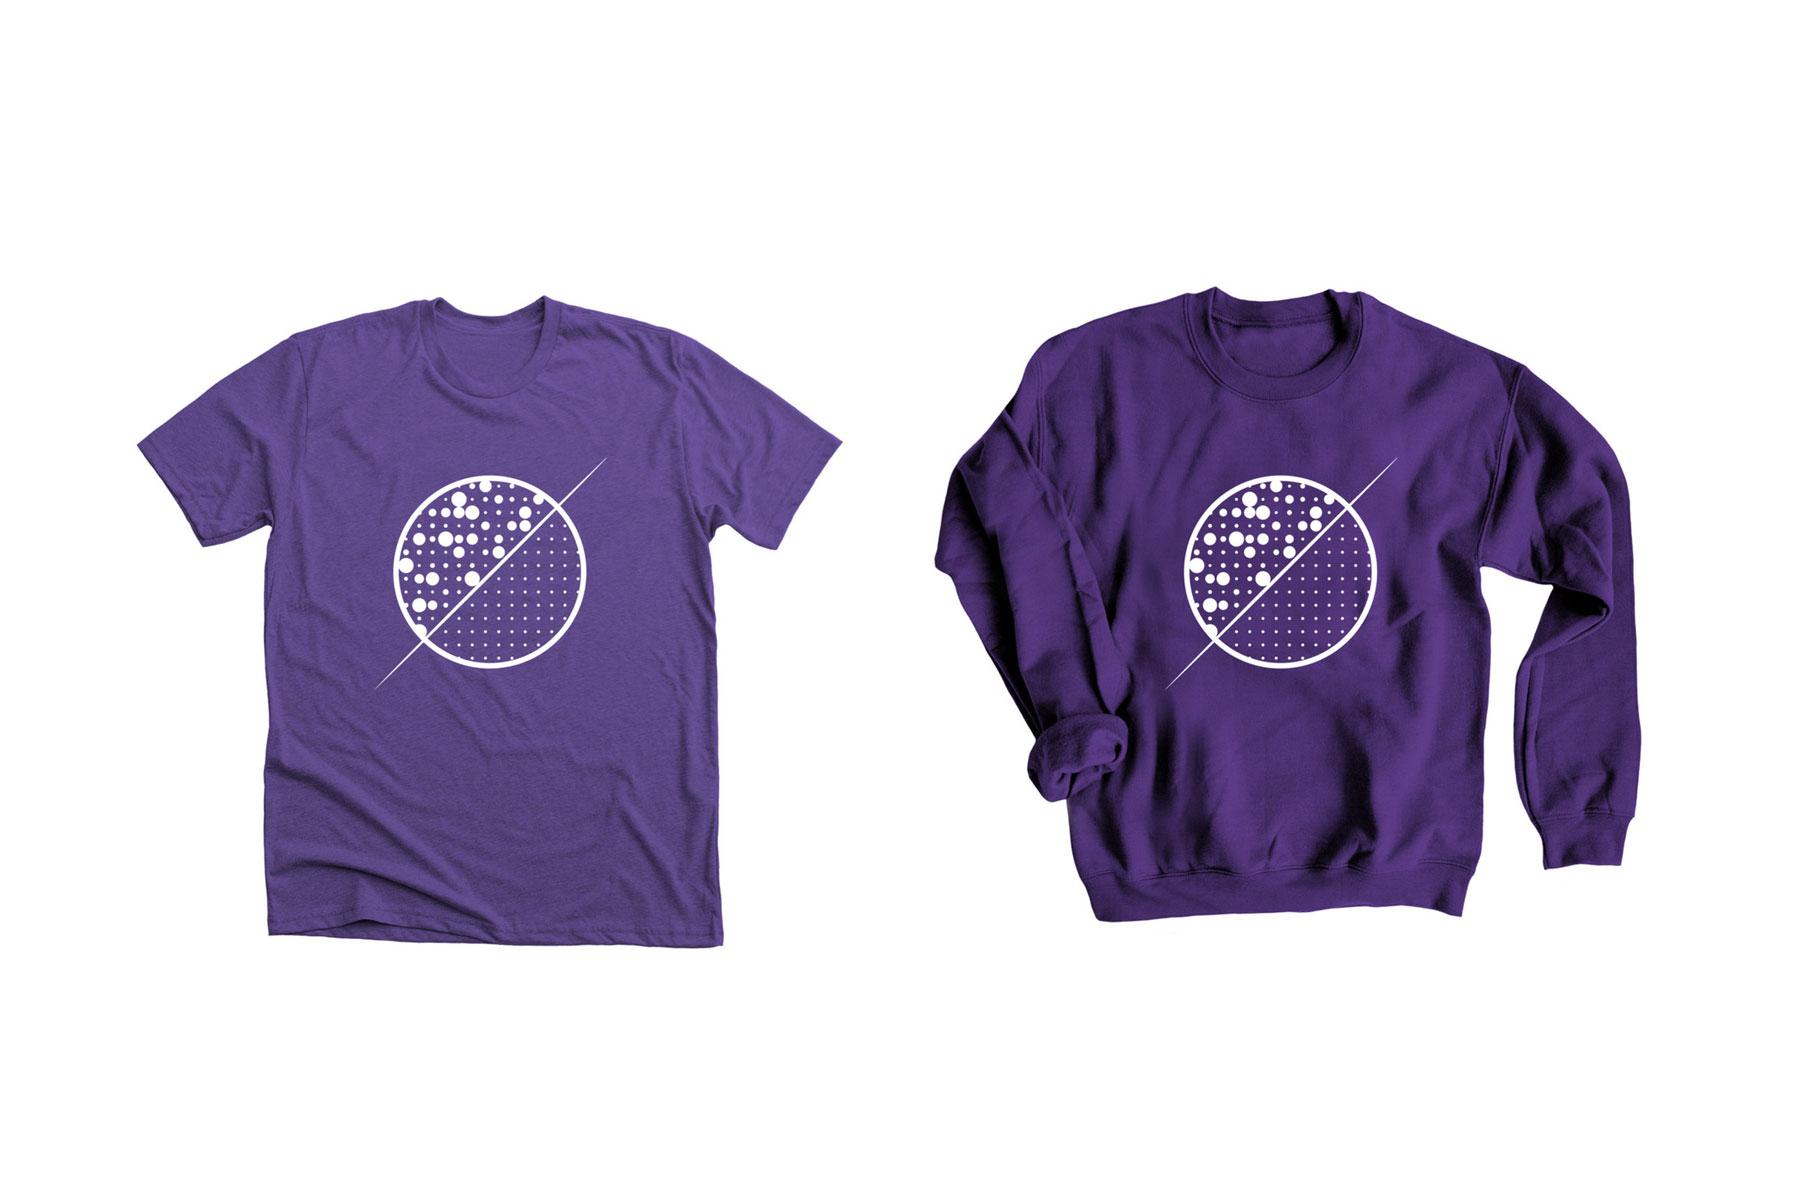 Felpa e t-shirt della campagna Cut it out!